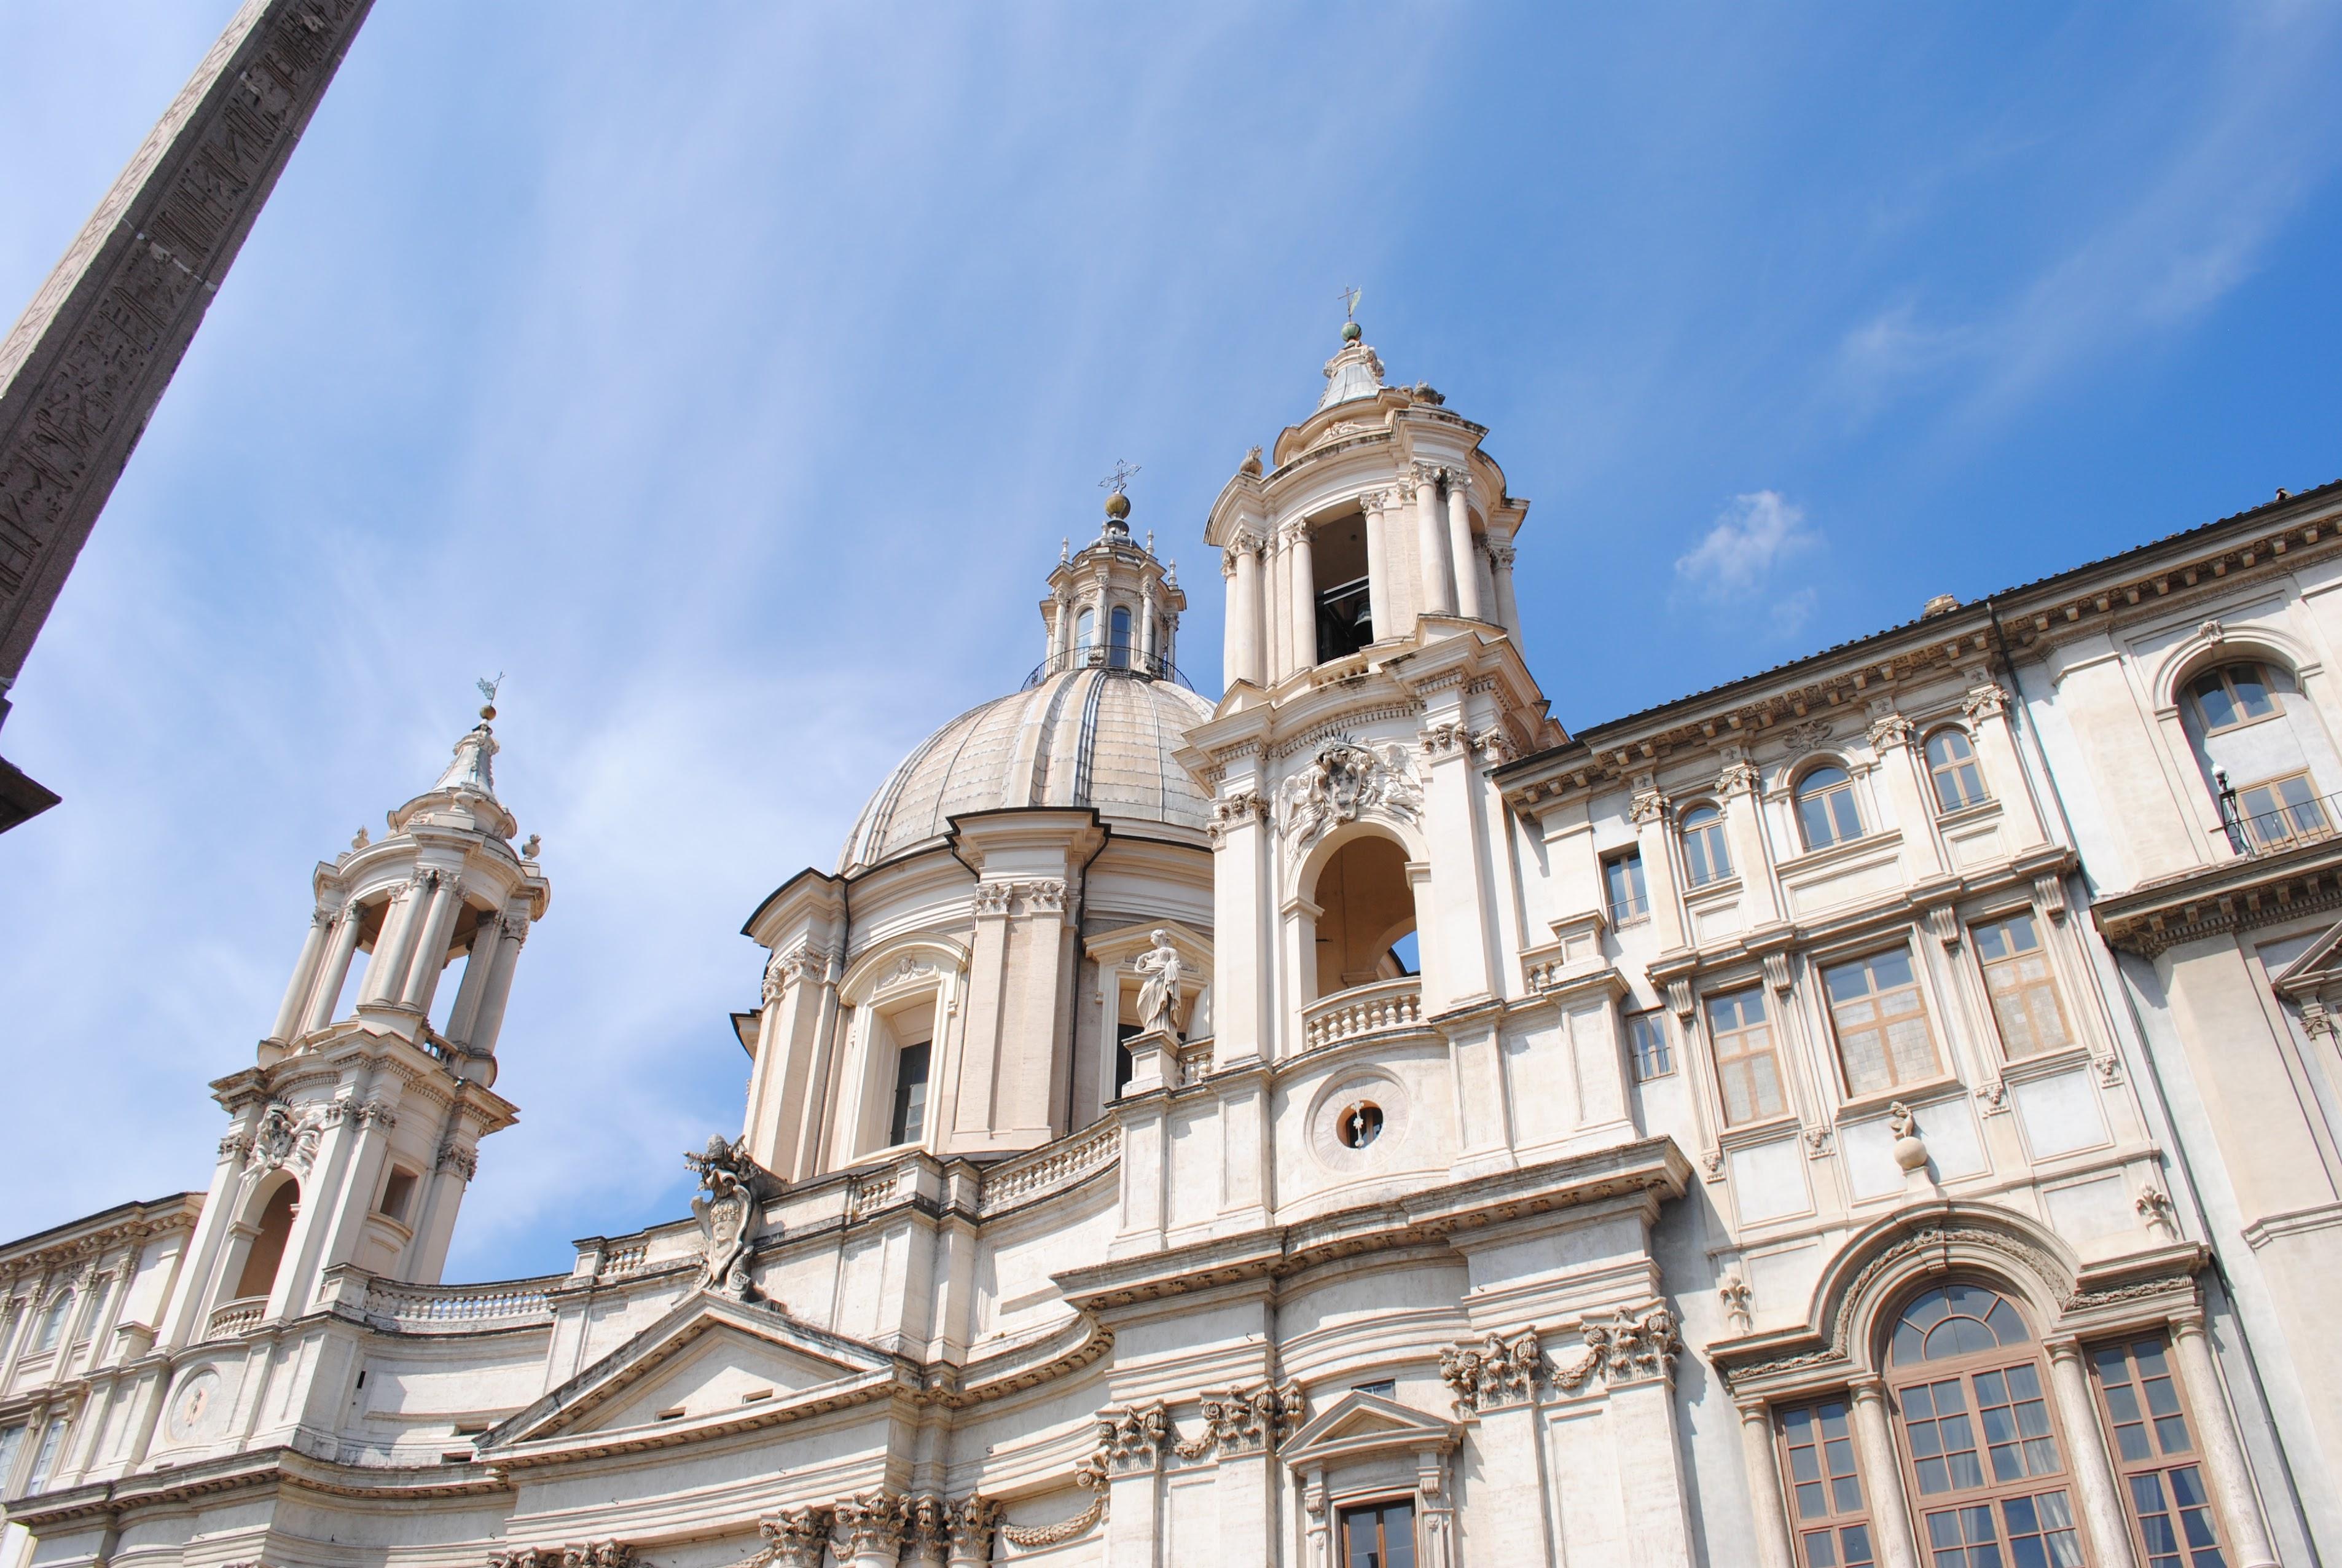 Chiesa de Sant'Agnese in Agone